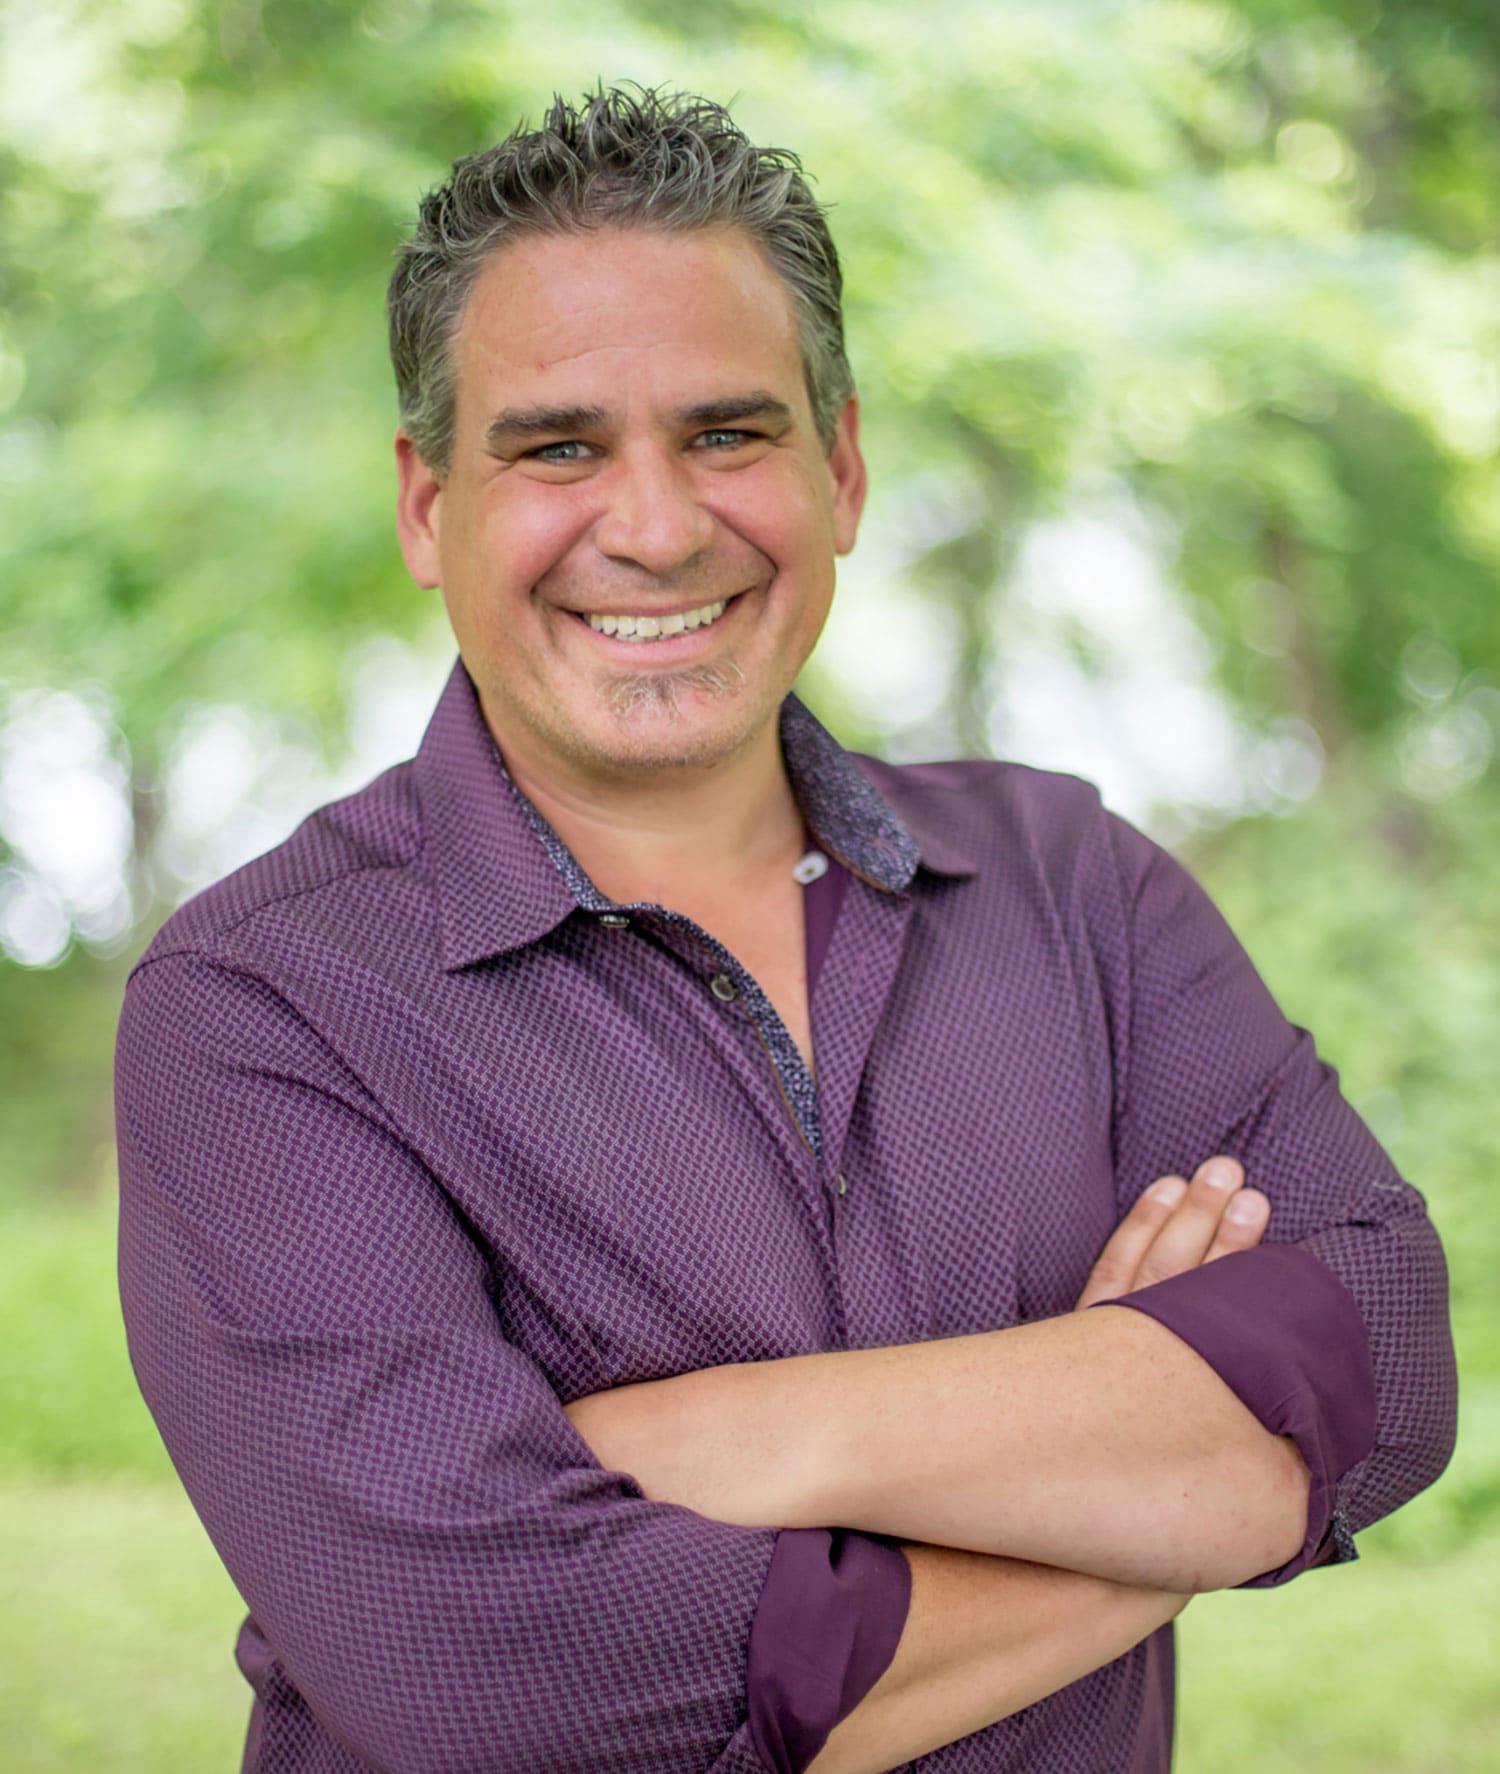 Rob Mescolotto